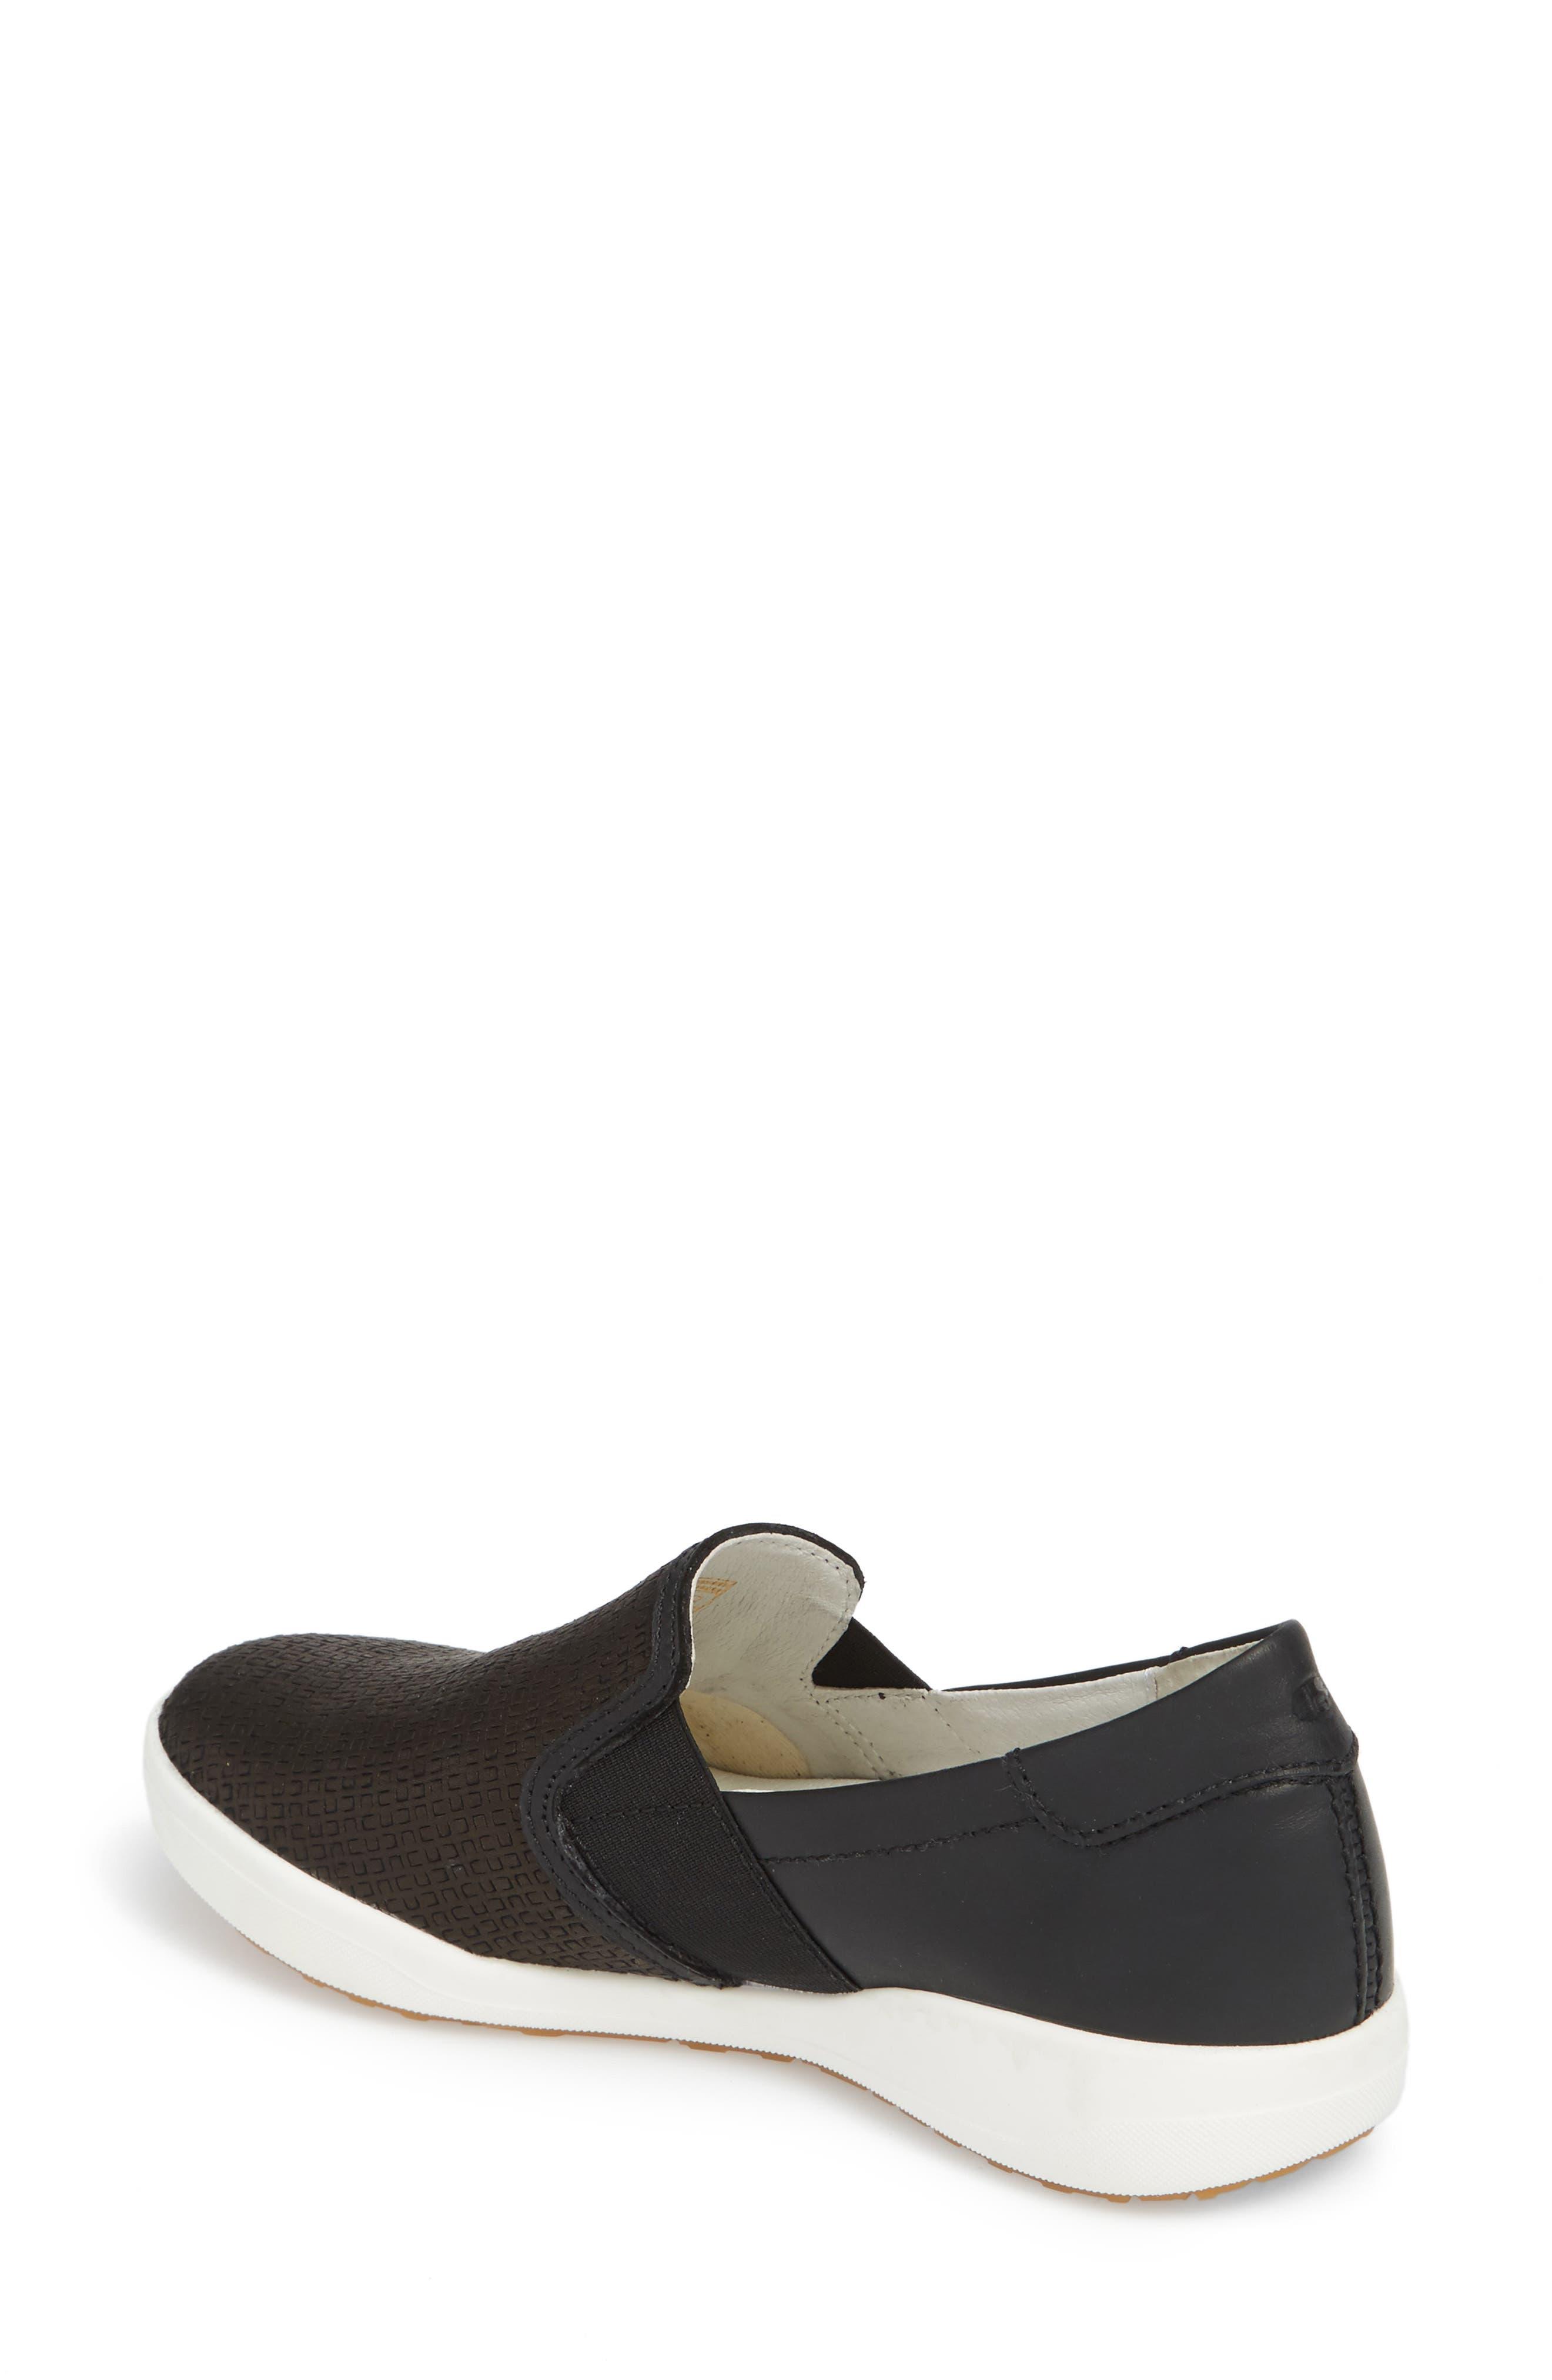 Sina 39 Sneaker,                             Alternate thumbnail 2, color,                             BLACK LEATHER